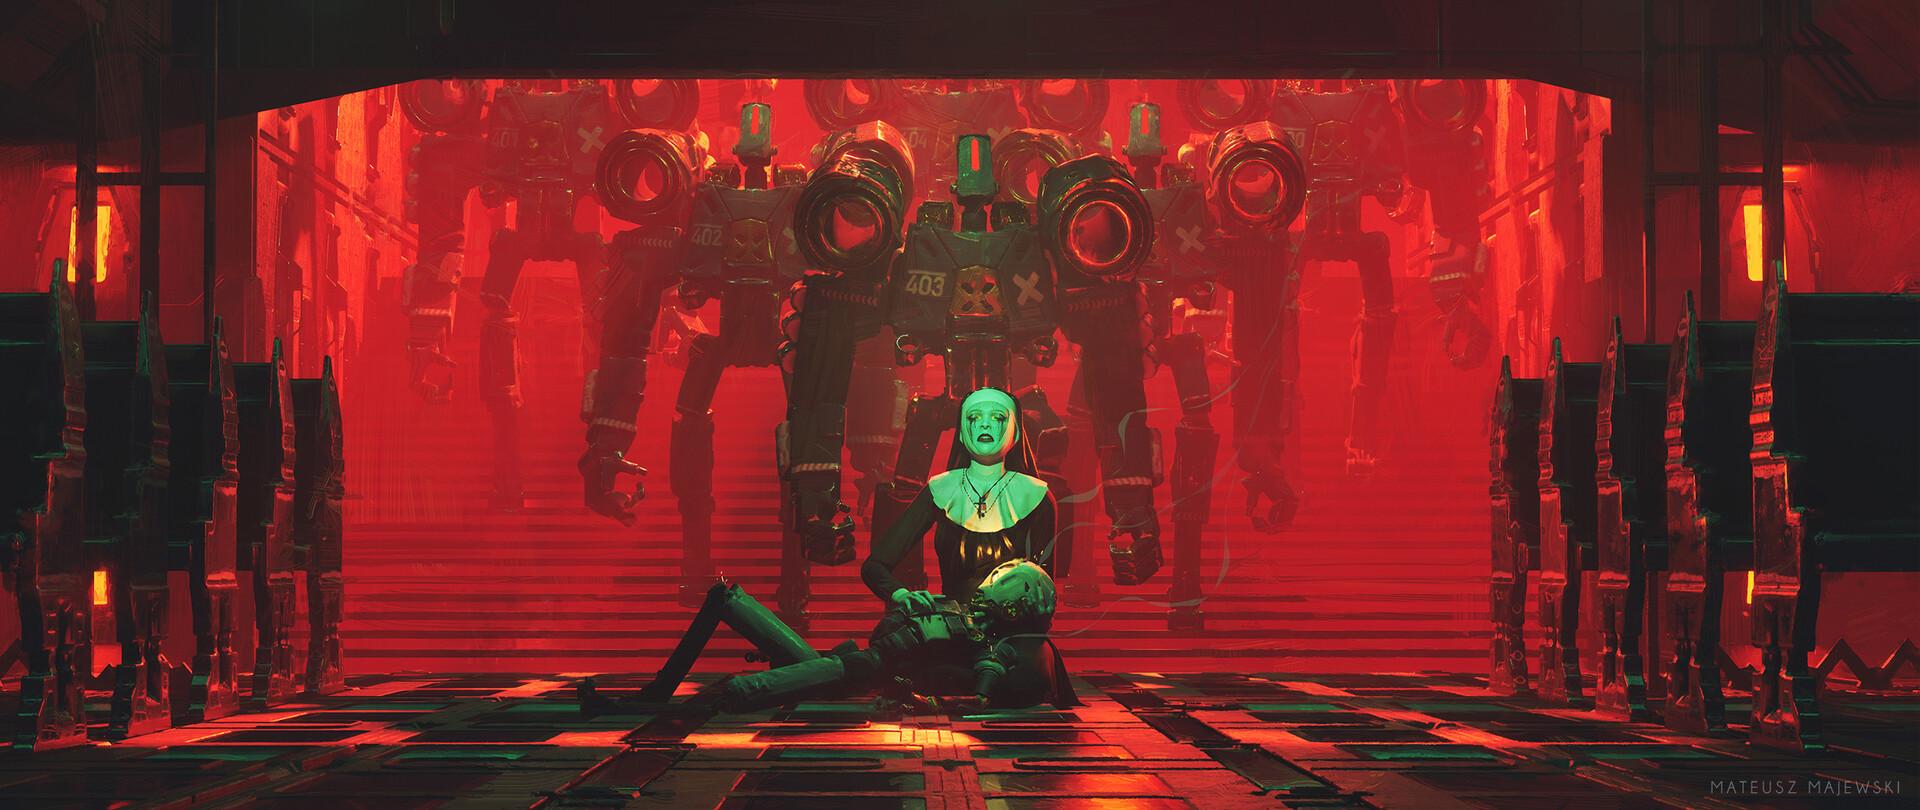 The Digital Sci-Fi Art of Mateusz Majewski